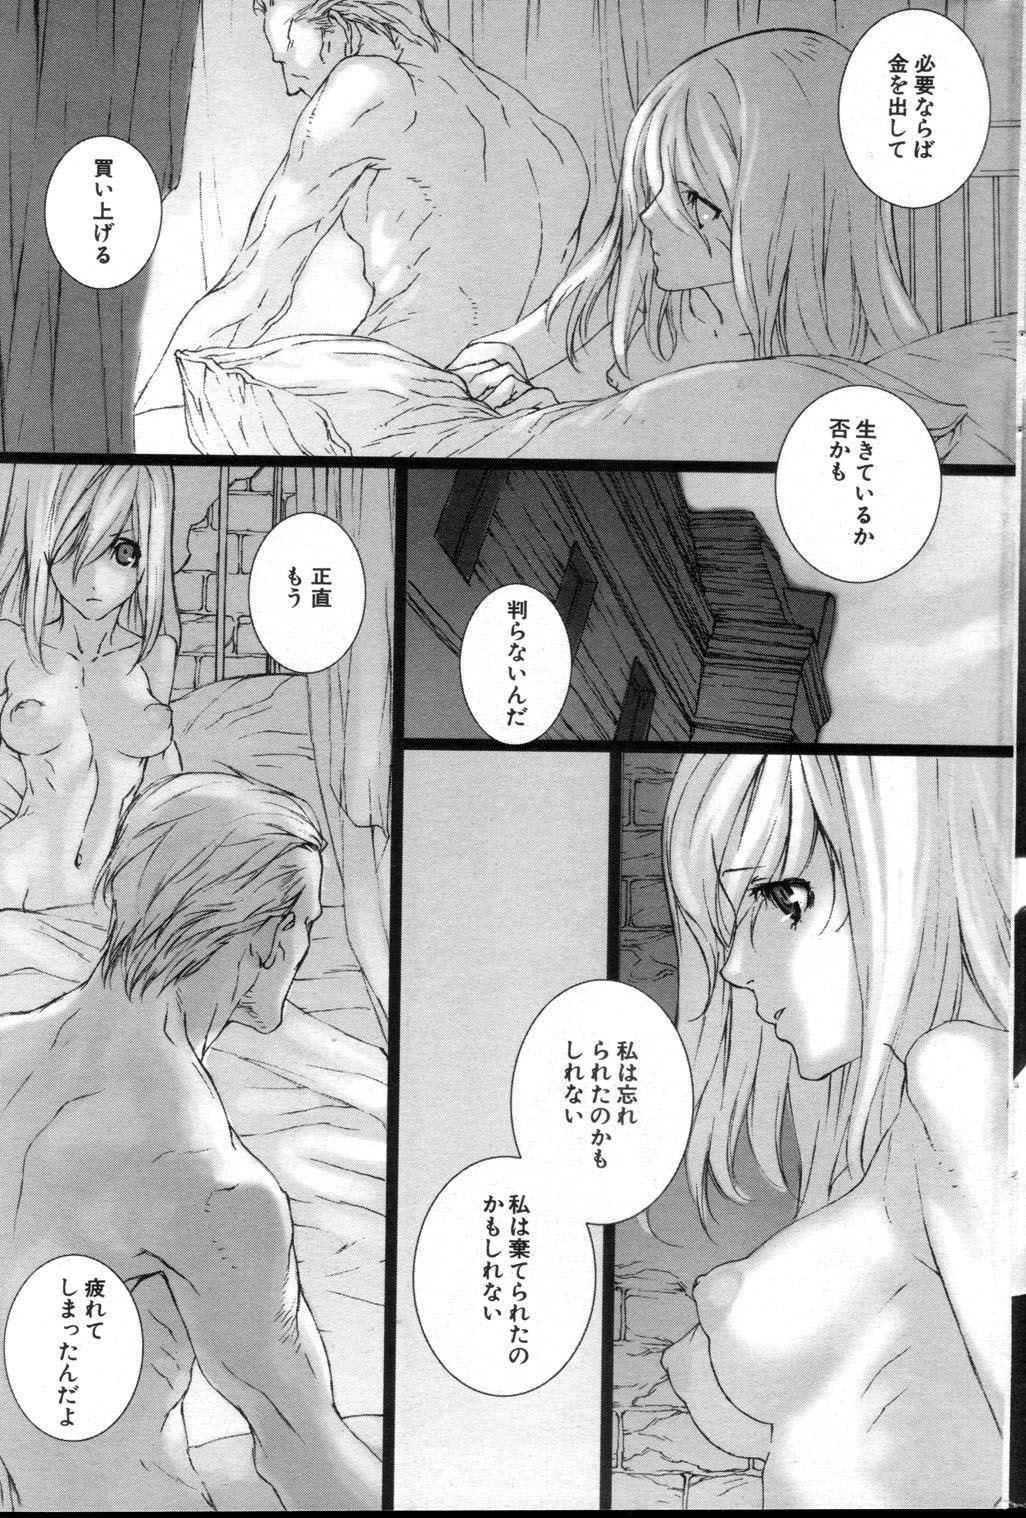 [Saiki Keita] FAIRY GONE GARDEN (Part Two) Kouhen 16